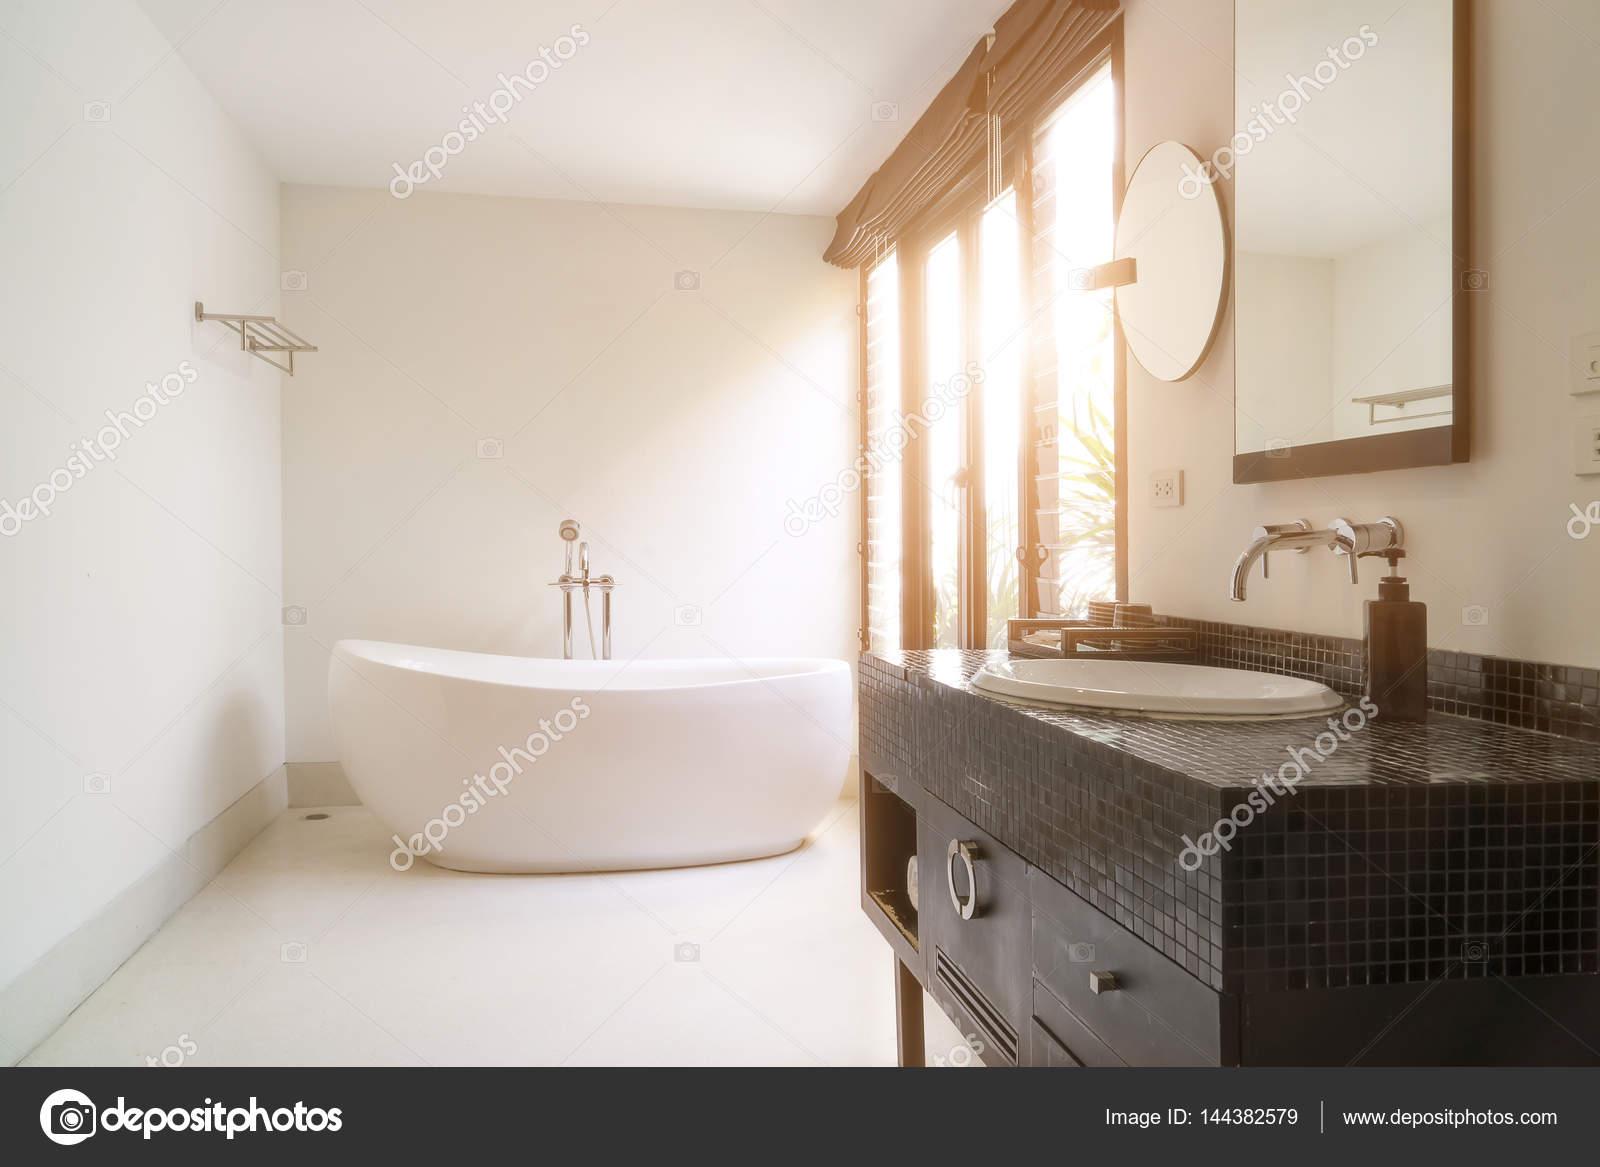 https://st3.depositphotos.com/1219867/14438/i/1600/depositphotos_144382579-stockafbeelding-moderne-badkamer-interieur-met-wit.jpg